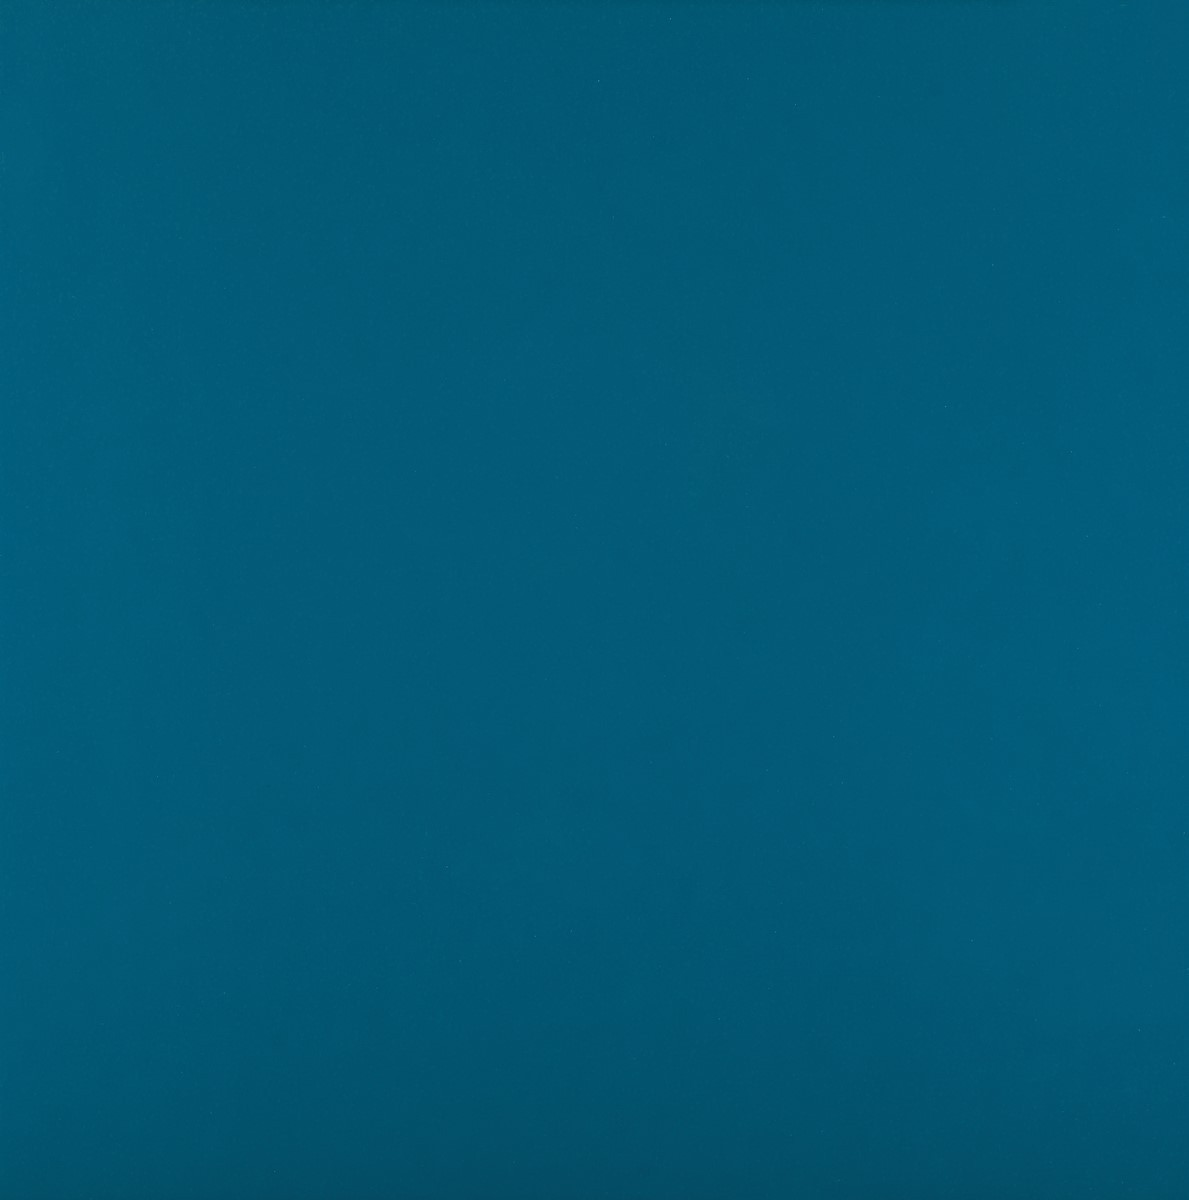 Floor Azul Brilho 33x33